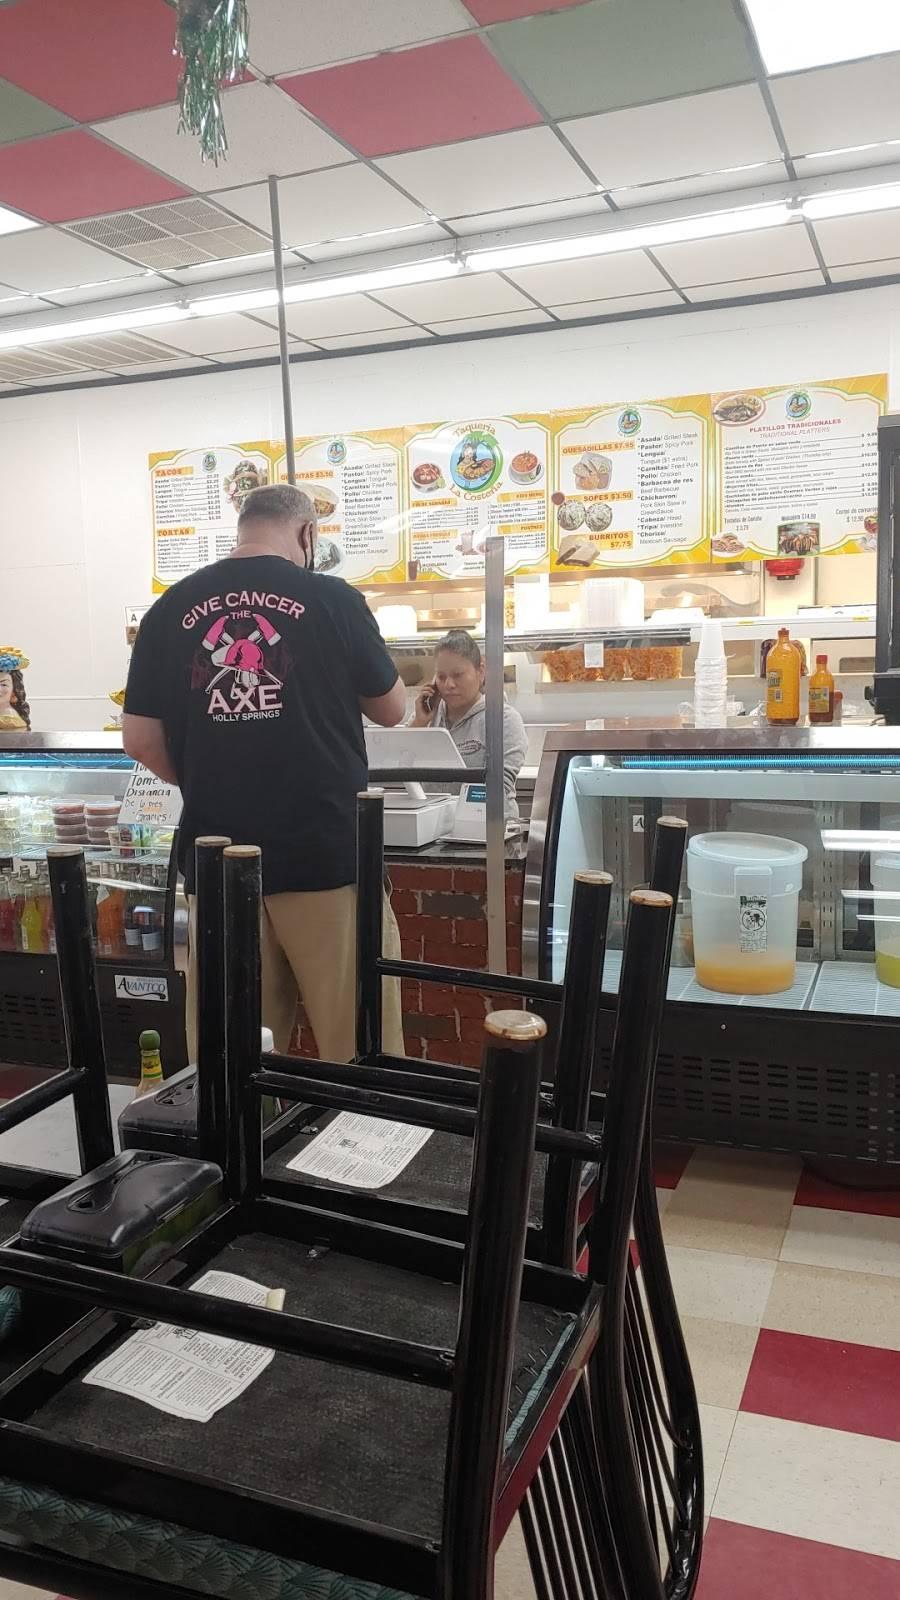 Taqueria La Costena | restaurant | 101 Dickens Rd, Fuquay-Varina, NC 27526, USA | 9192853060 OR +1 919-285-3060